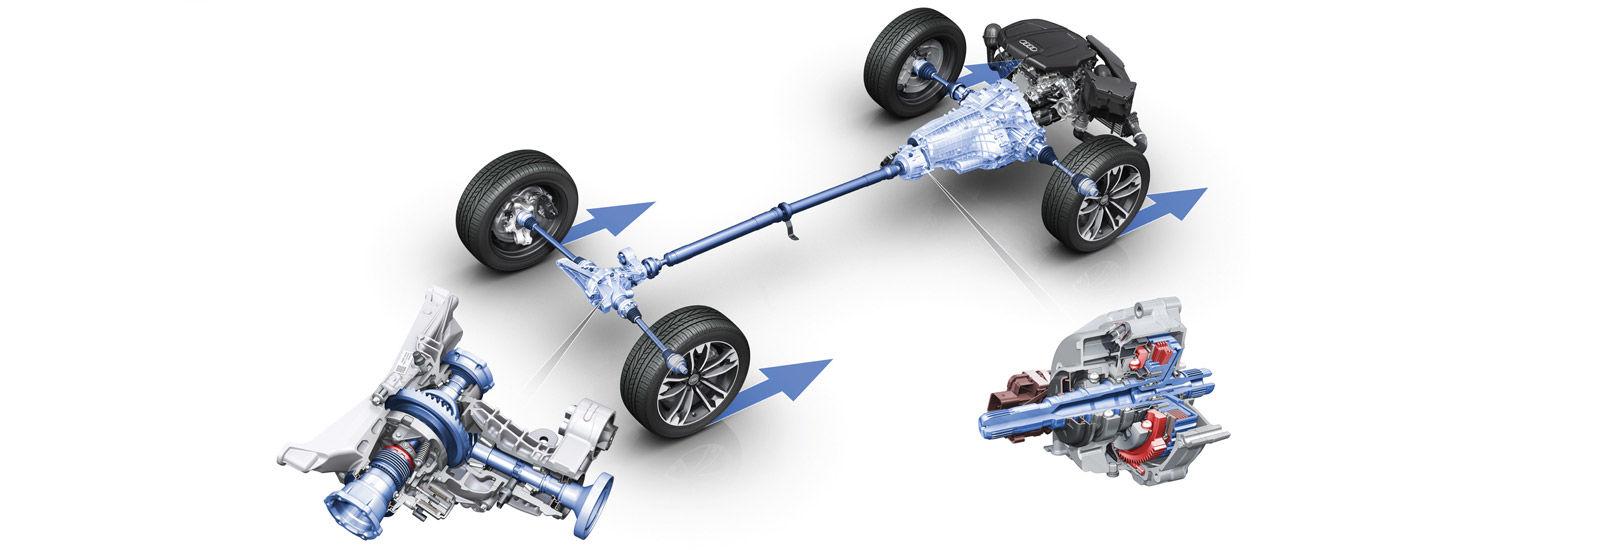 Audis quattro allwheel drive system explained  carwow